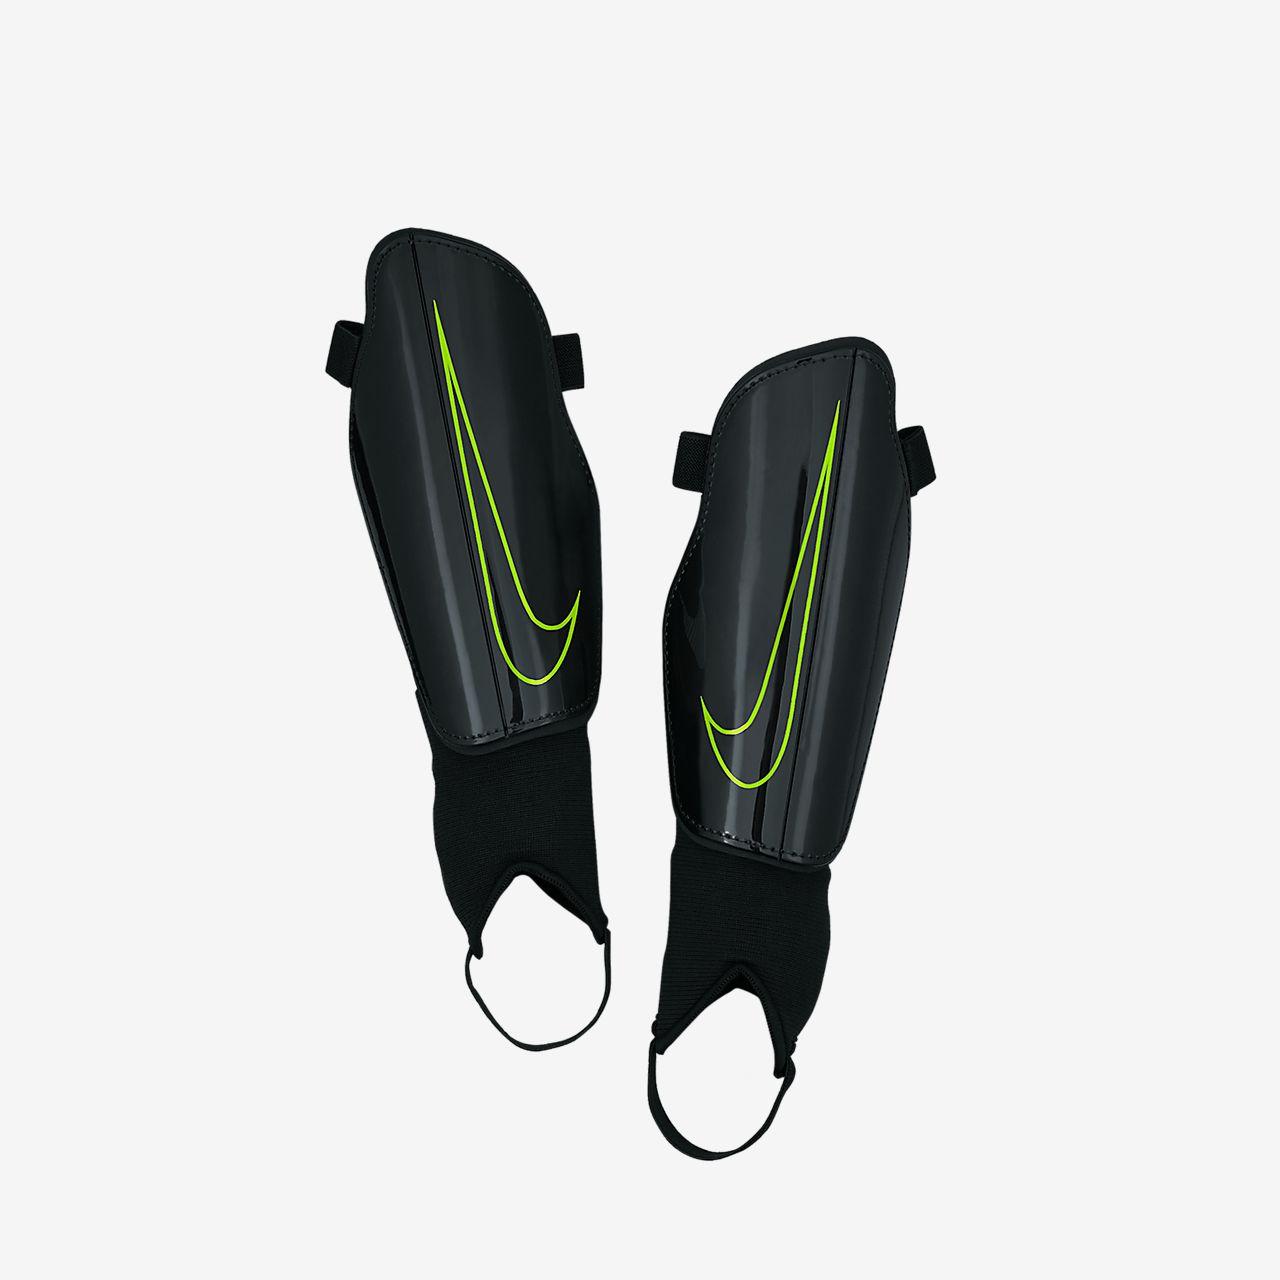 Skenbensskydd för fotboll Nike Charge 2.0